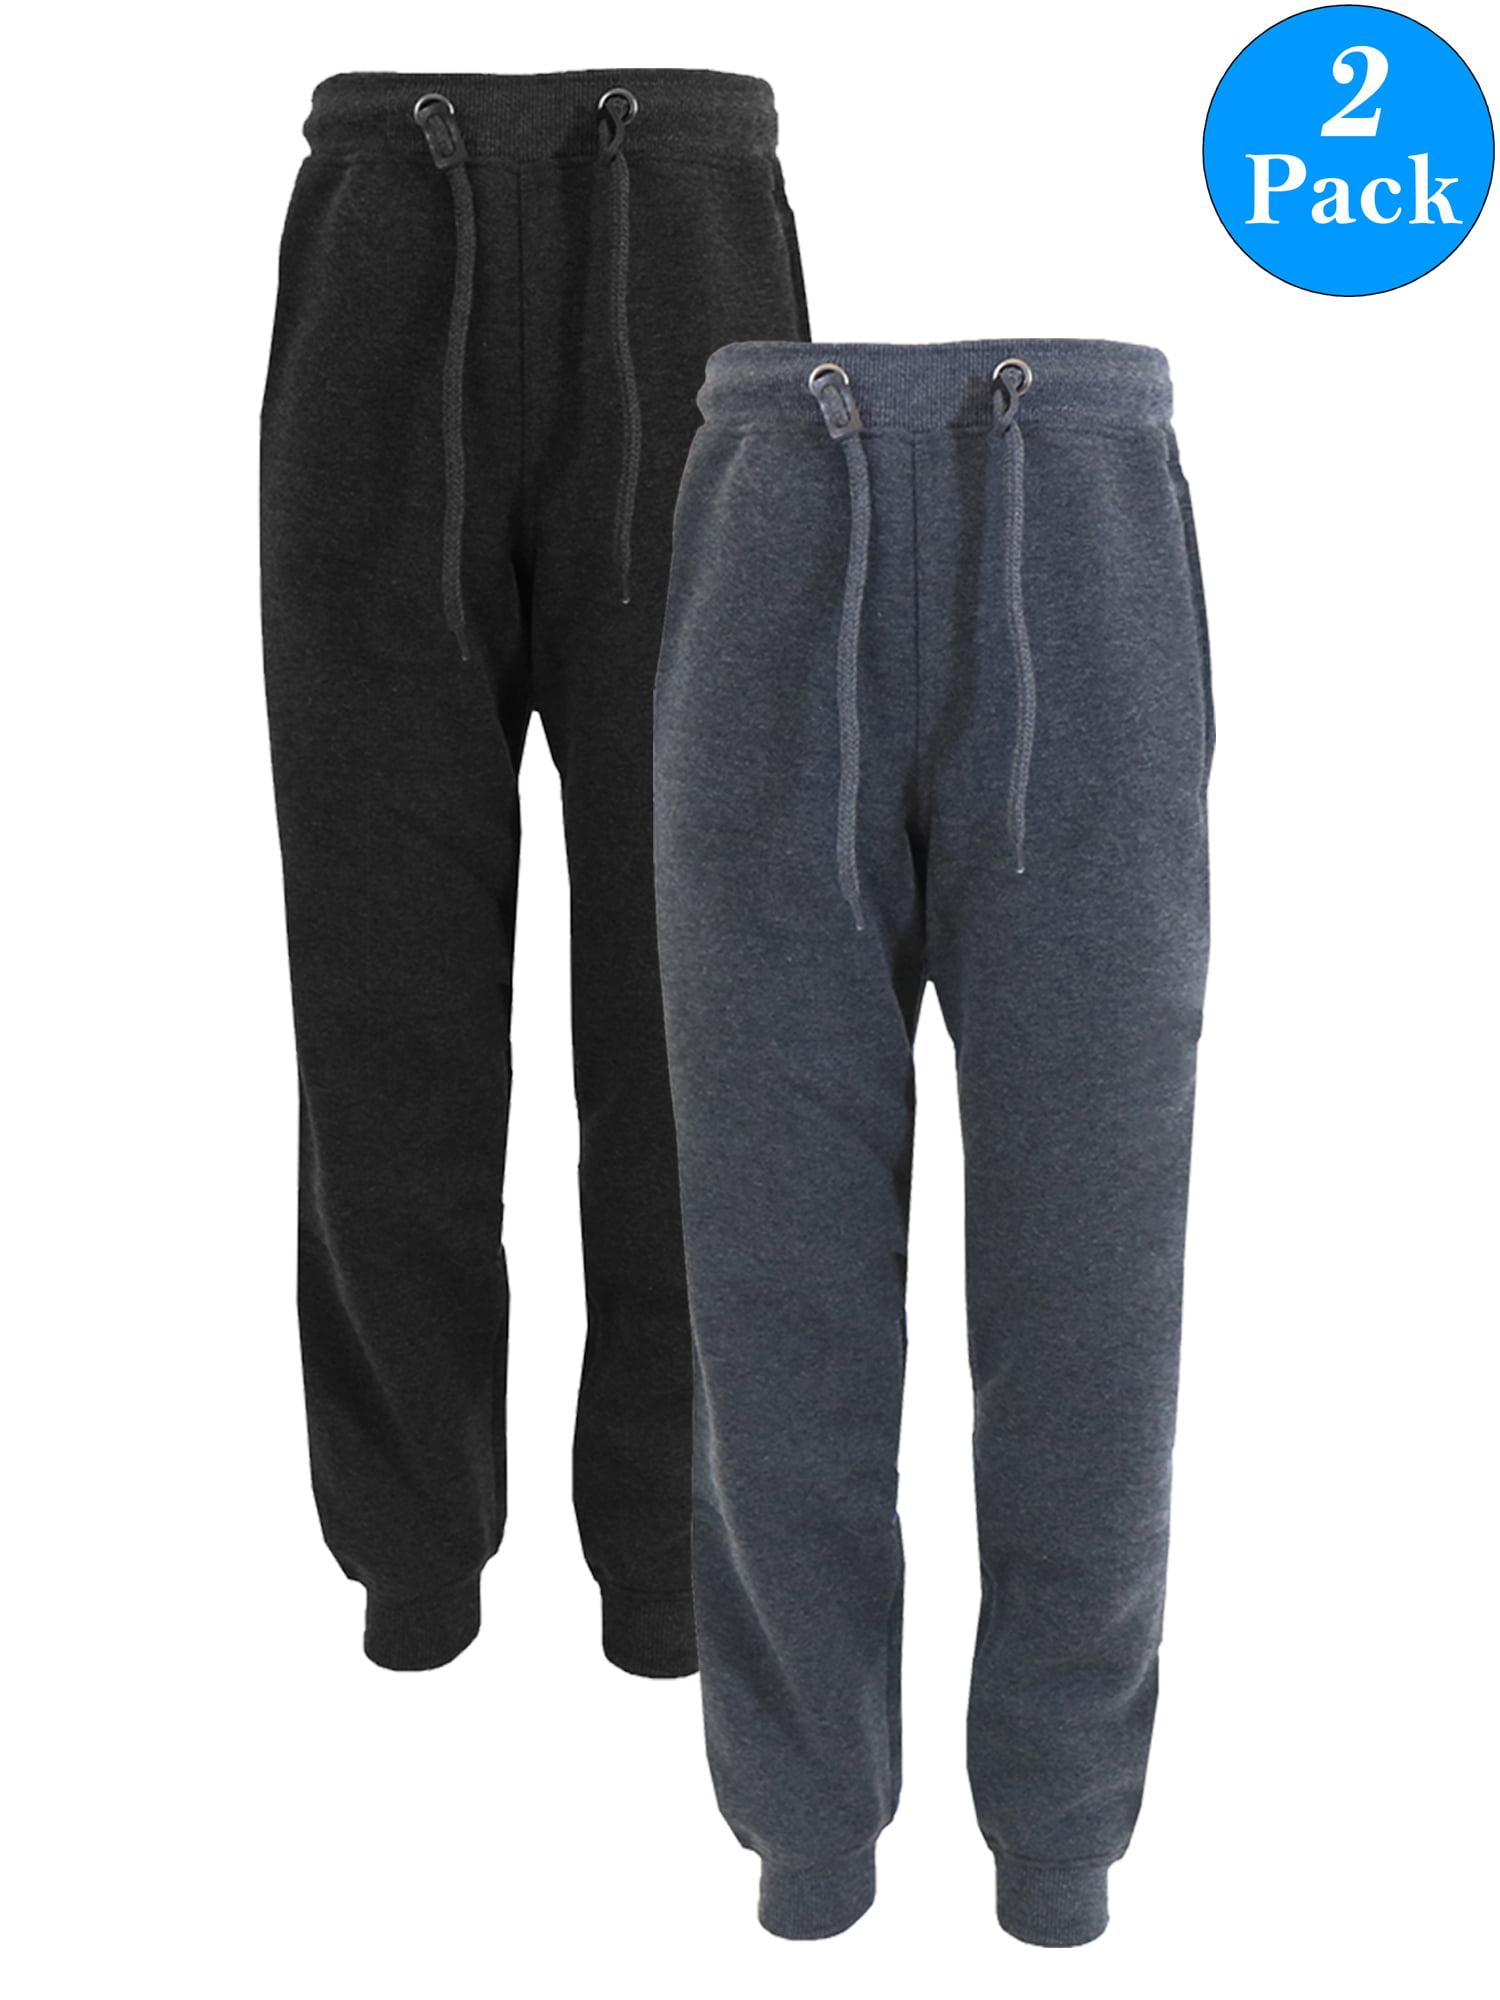 Boy's Slim-Fit Fleece Jogger Sweatpants (2-Pack)